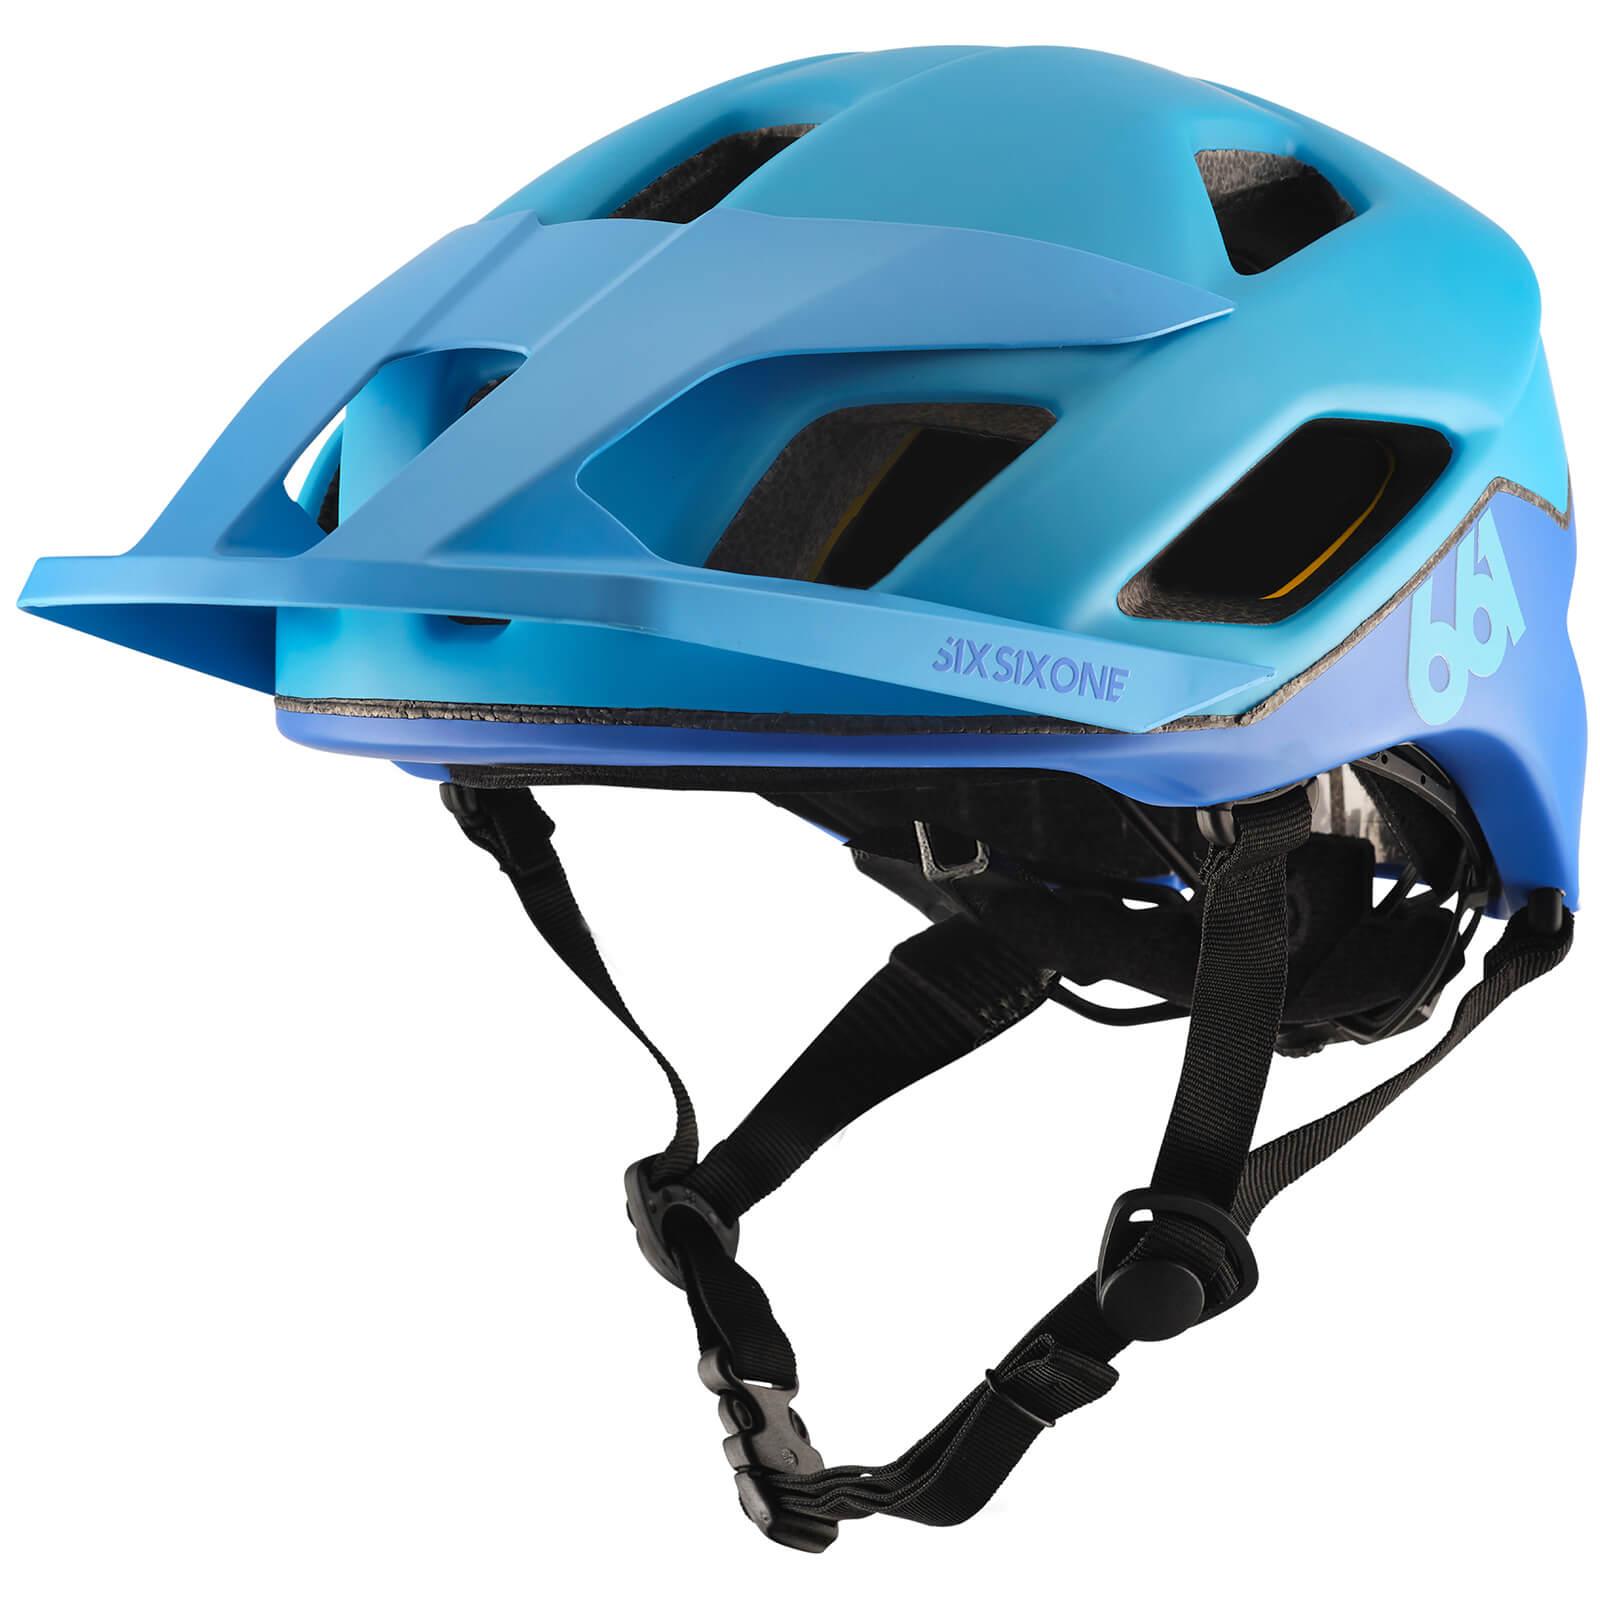 SixSixOne Crest MIPS MTB Helmet - XS/S - Blue/Blue